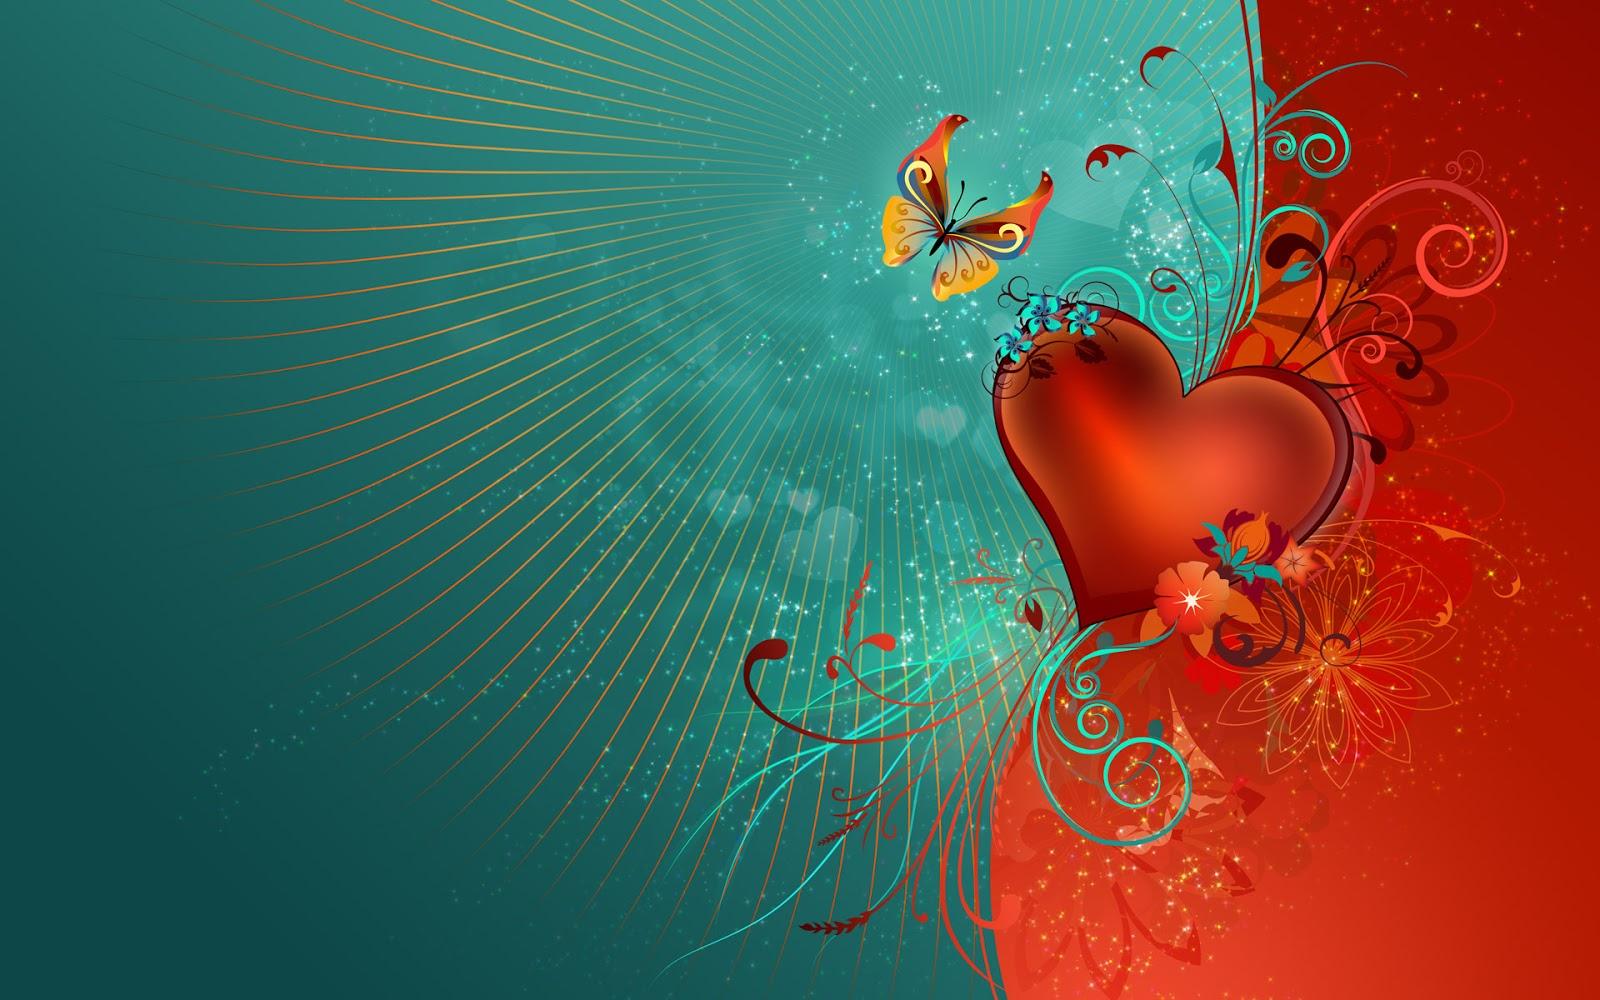 http://4.bp.blogspot.com/-MtWe1FlQgjg/UPbEXGHiYbI/AAAAAAAACCg/nw1pC8EkTPw/s1600/valentines+day+decstop+backgrounds+(2).jpg